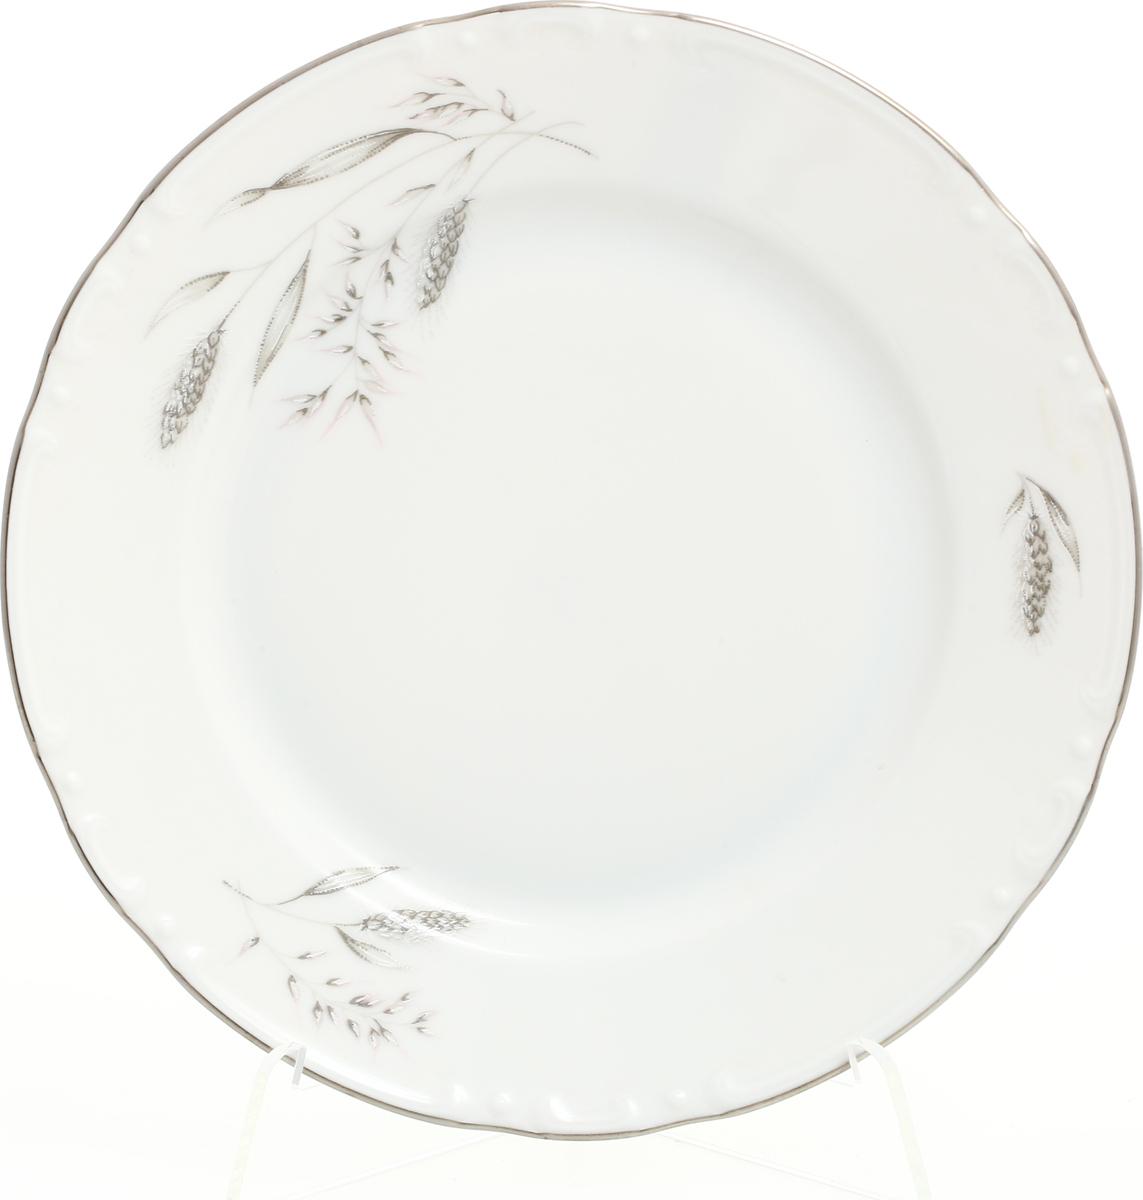 "Набор тарелок Thun ""Констанция. Серебряные колосья"", диаметр 17 см, 6 шт"